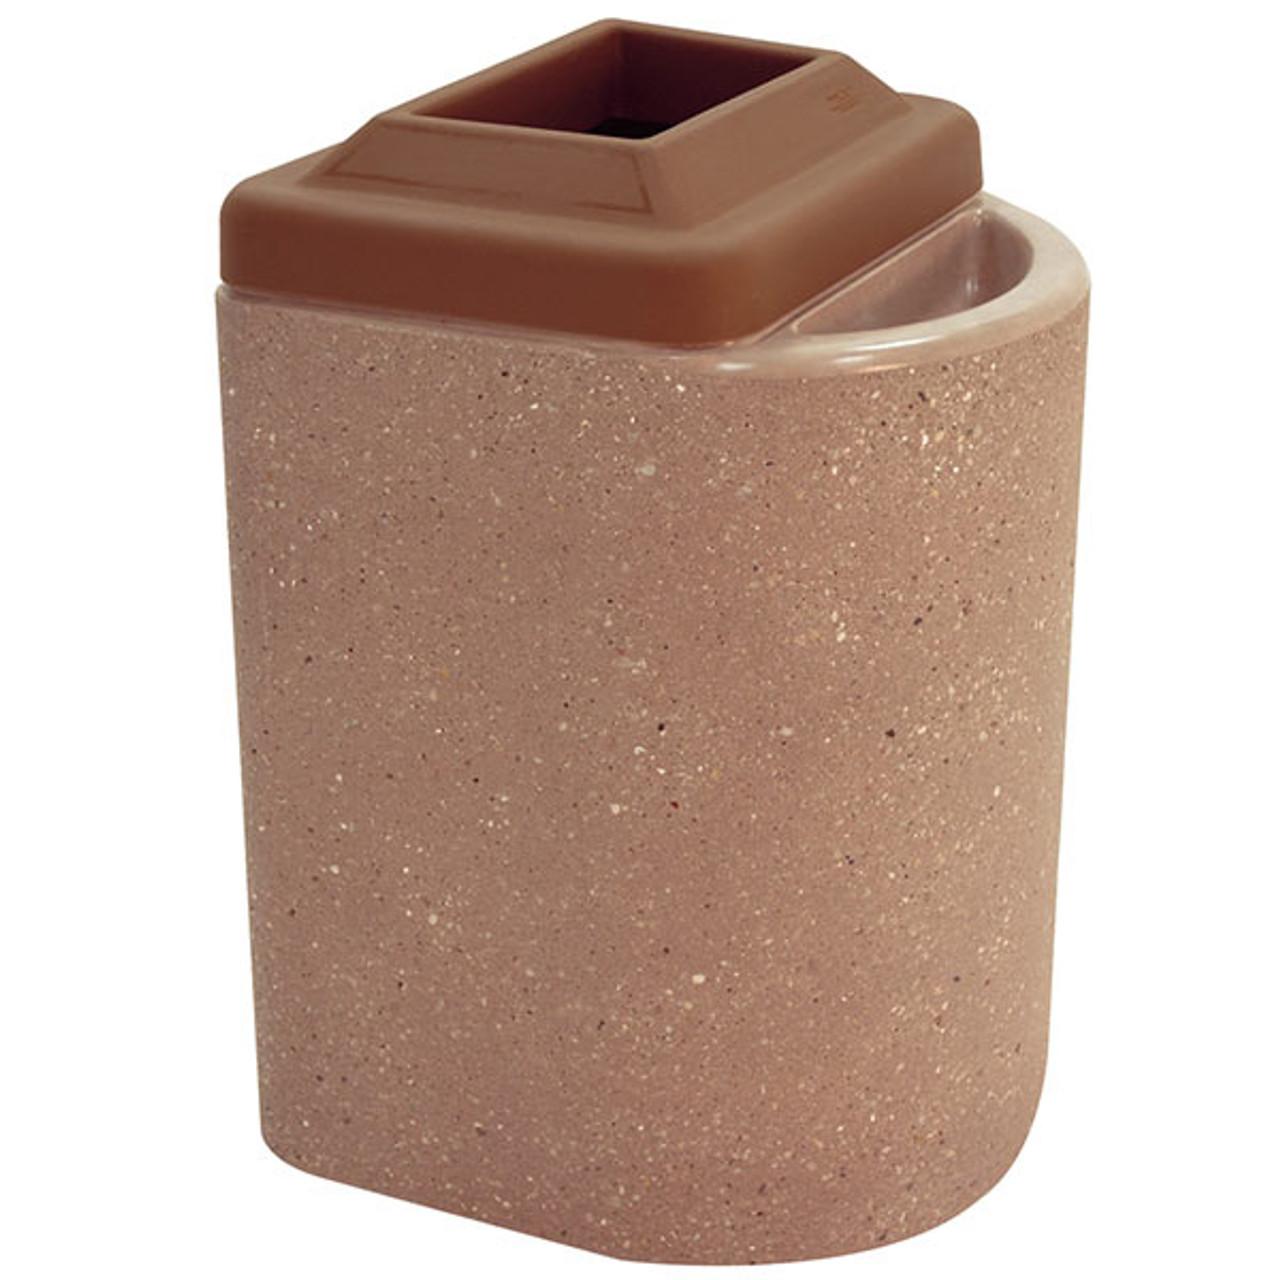 20 Gallon Concrete Outdoor Ash Trash Waste Container TF2085 Weatherstone